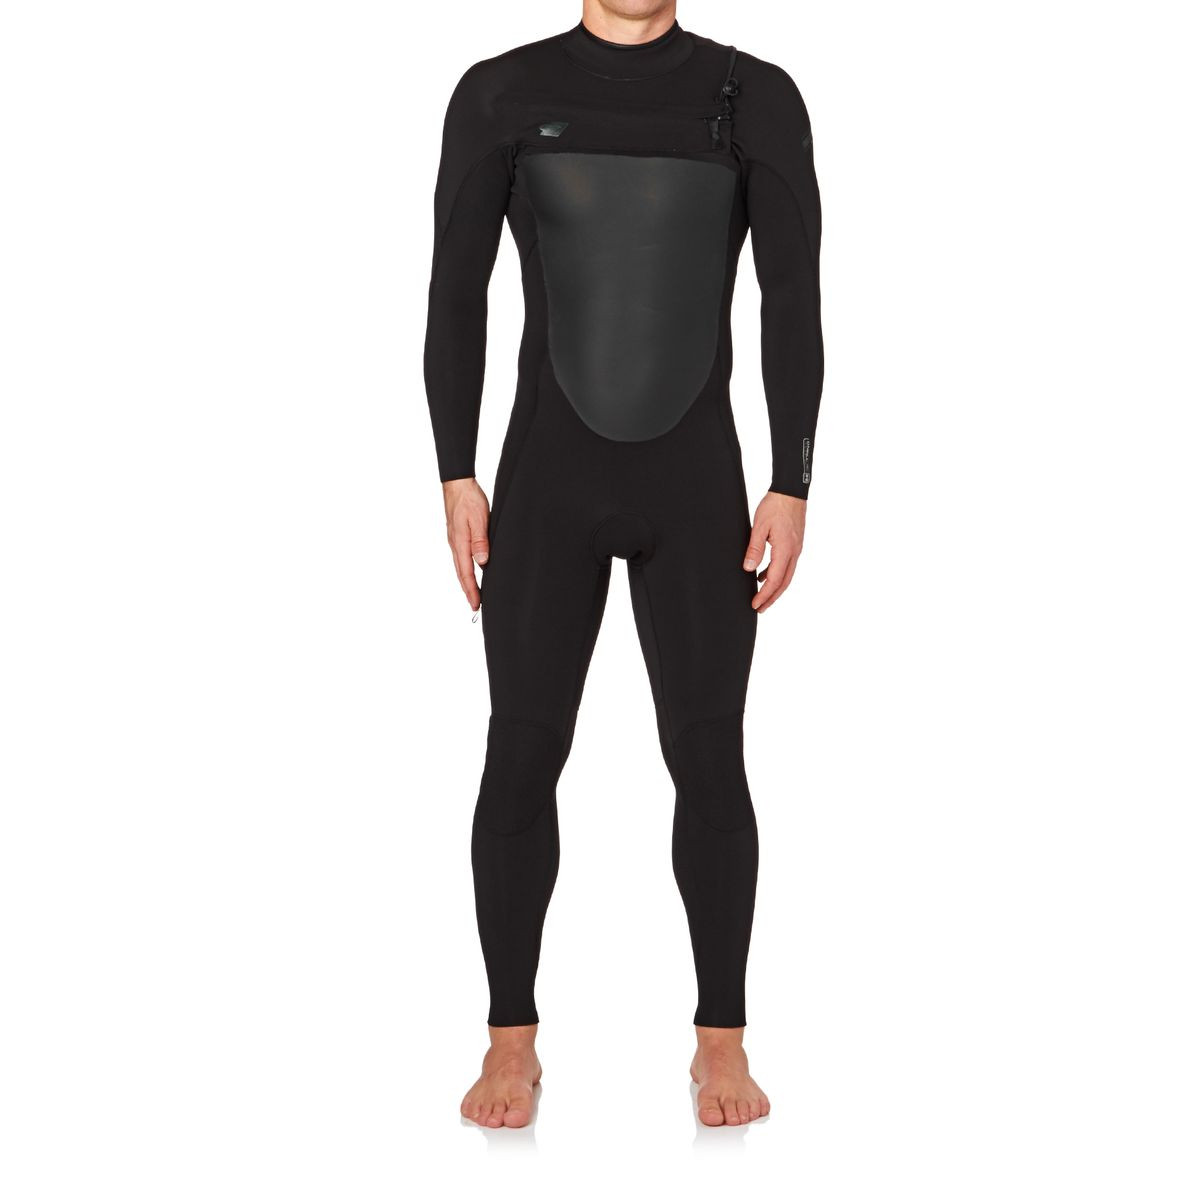 O'Neill Superfreak 3/2mm 2017 Chest Zip Wetsuit - Black/ Black/ Black